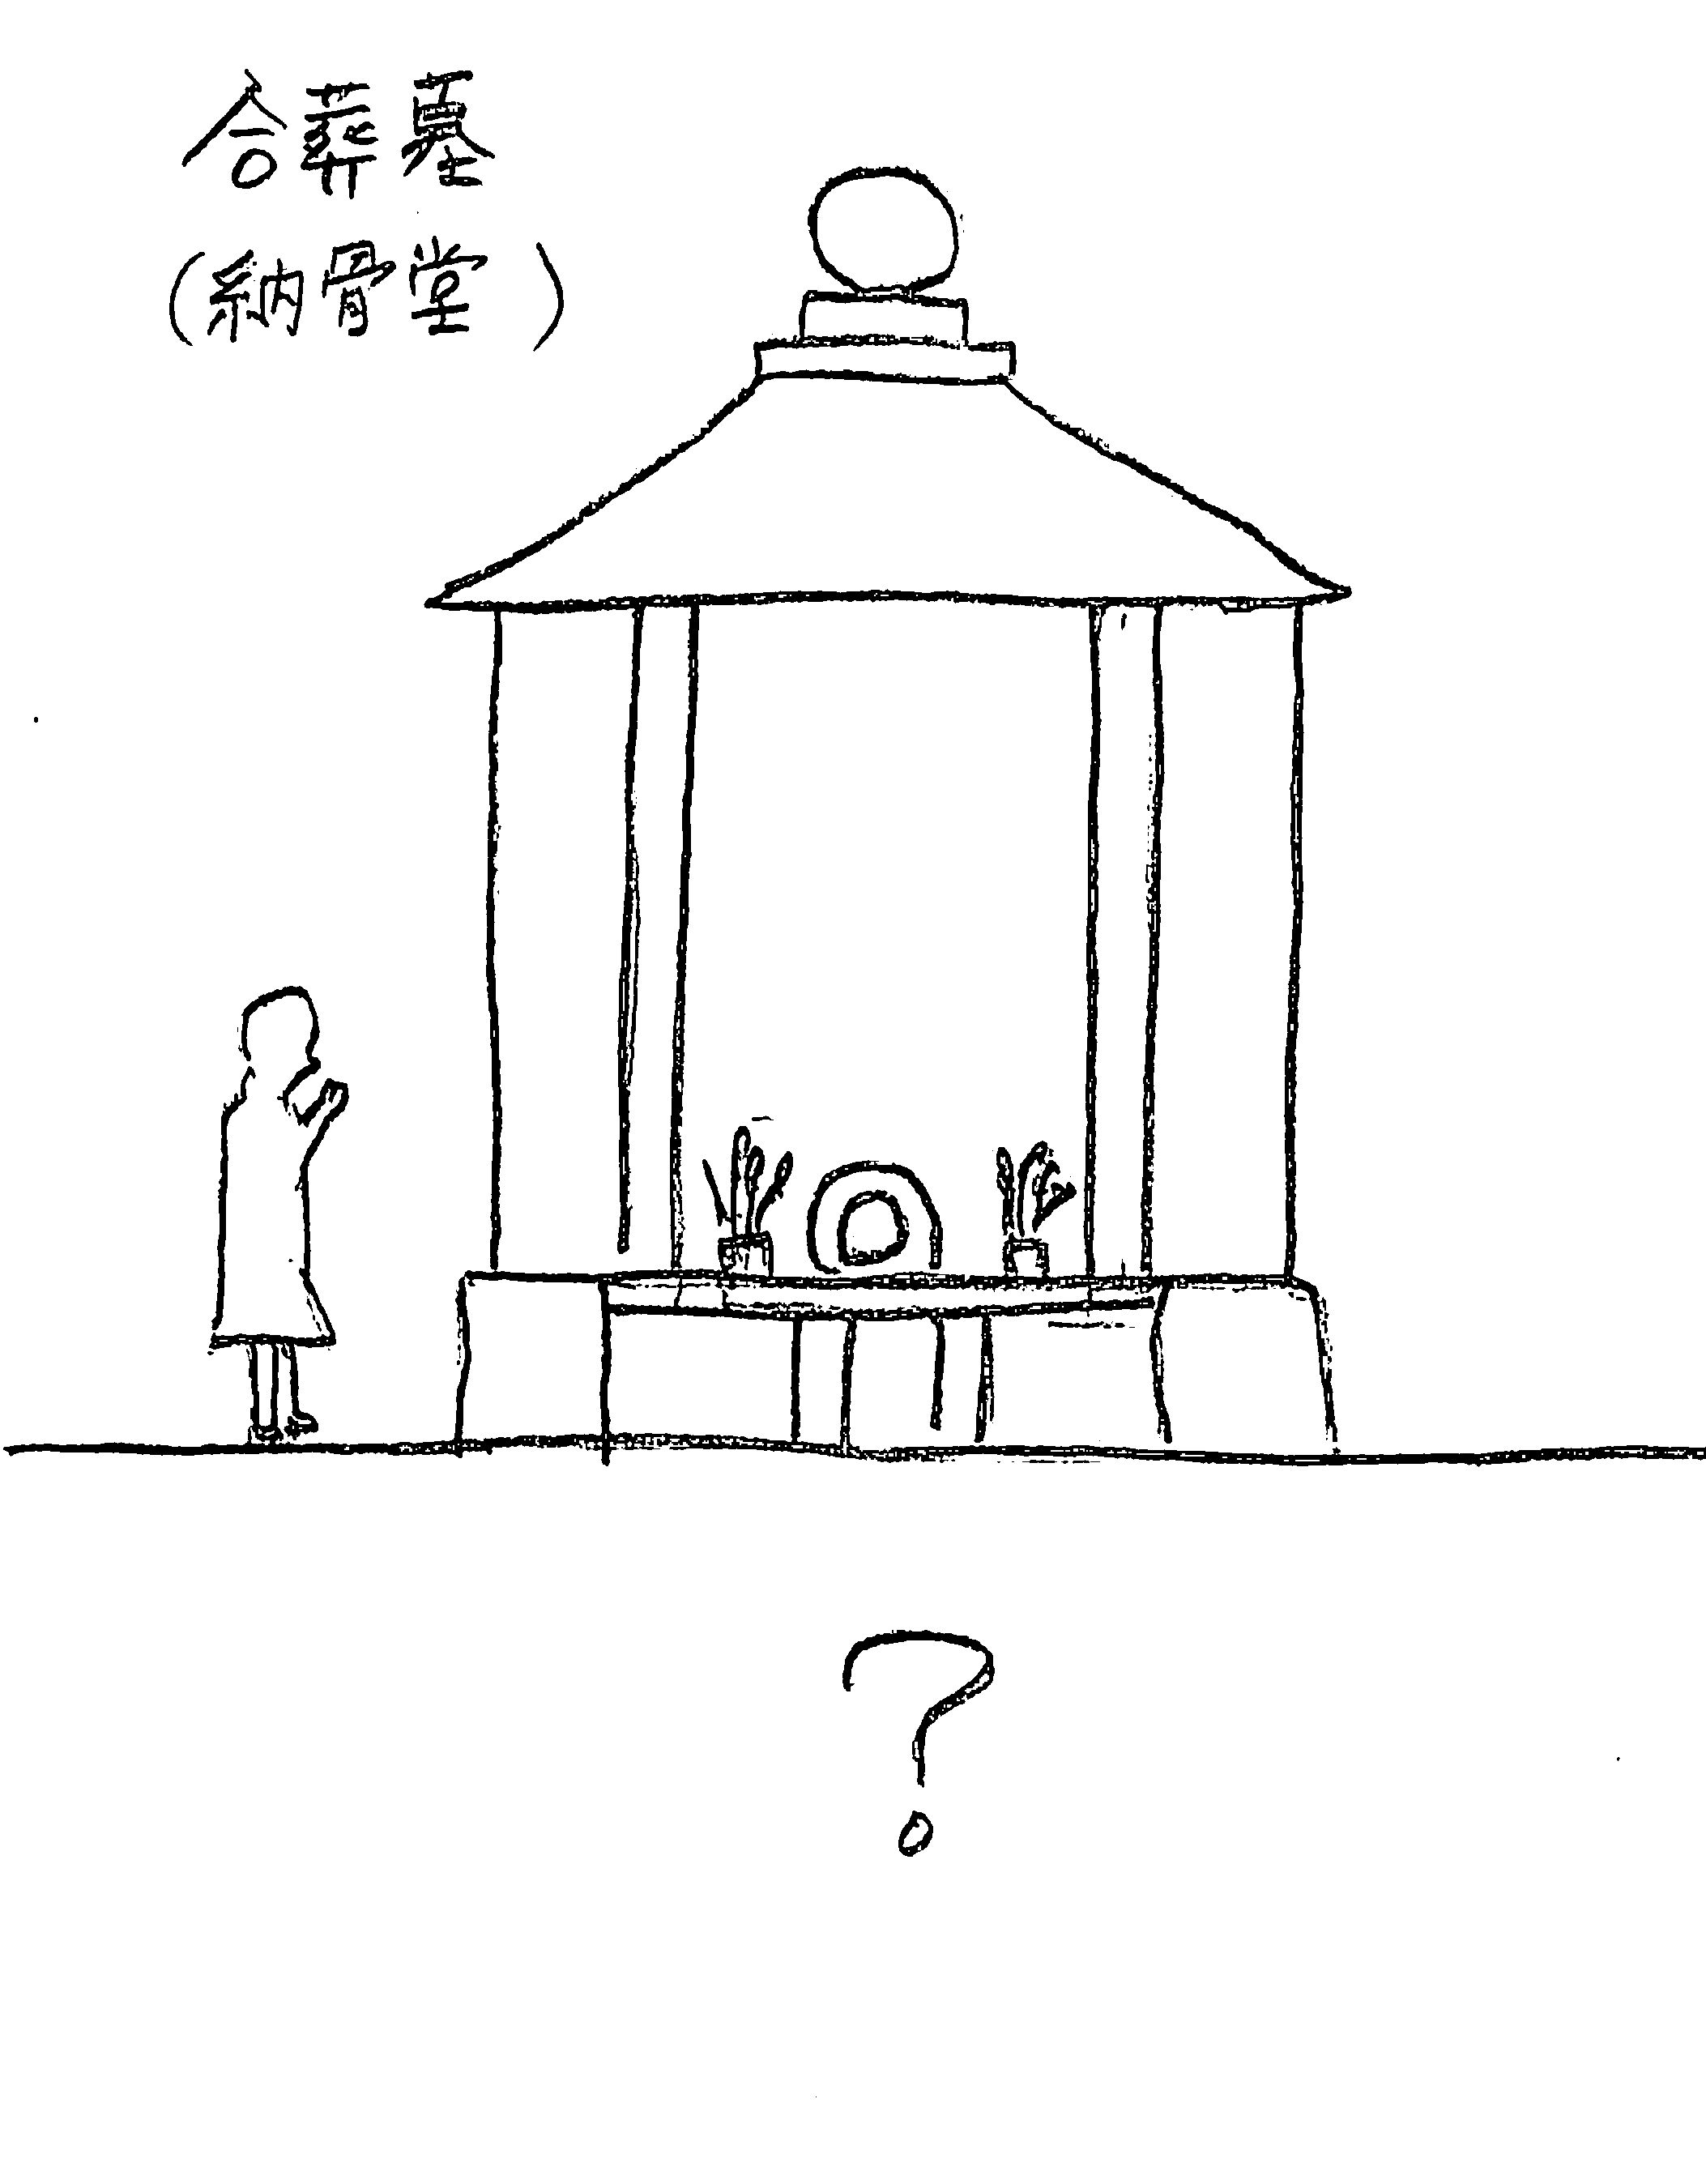 合葬墓の外観